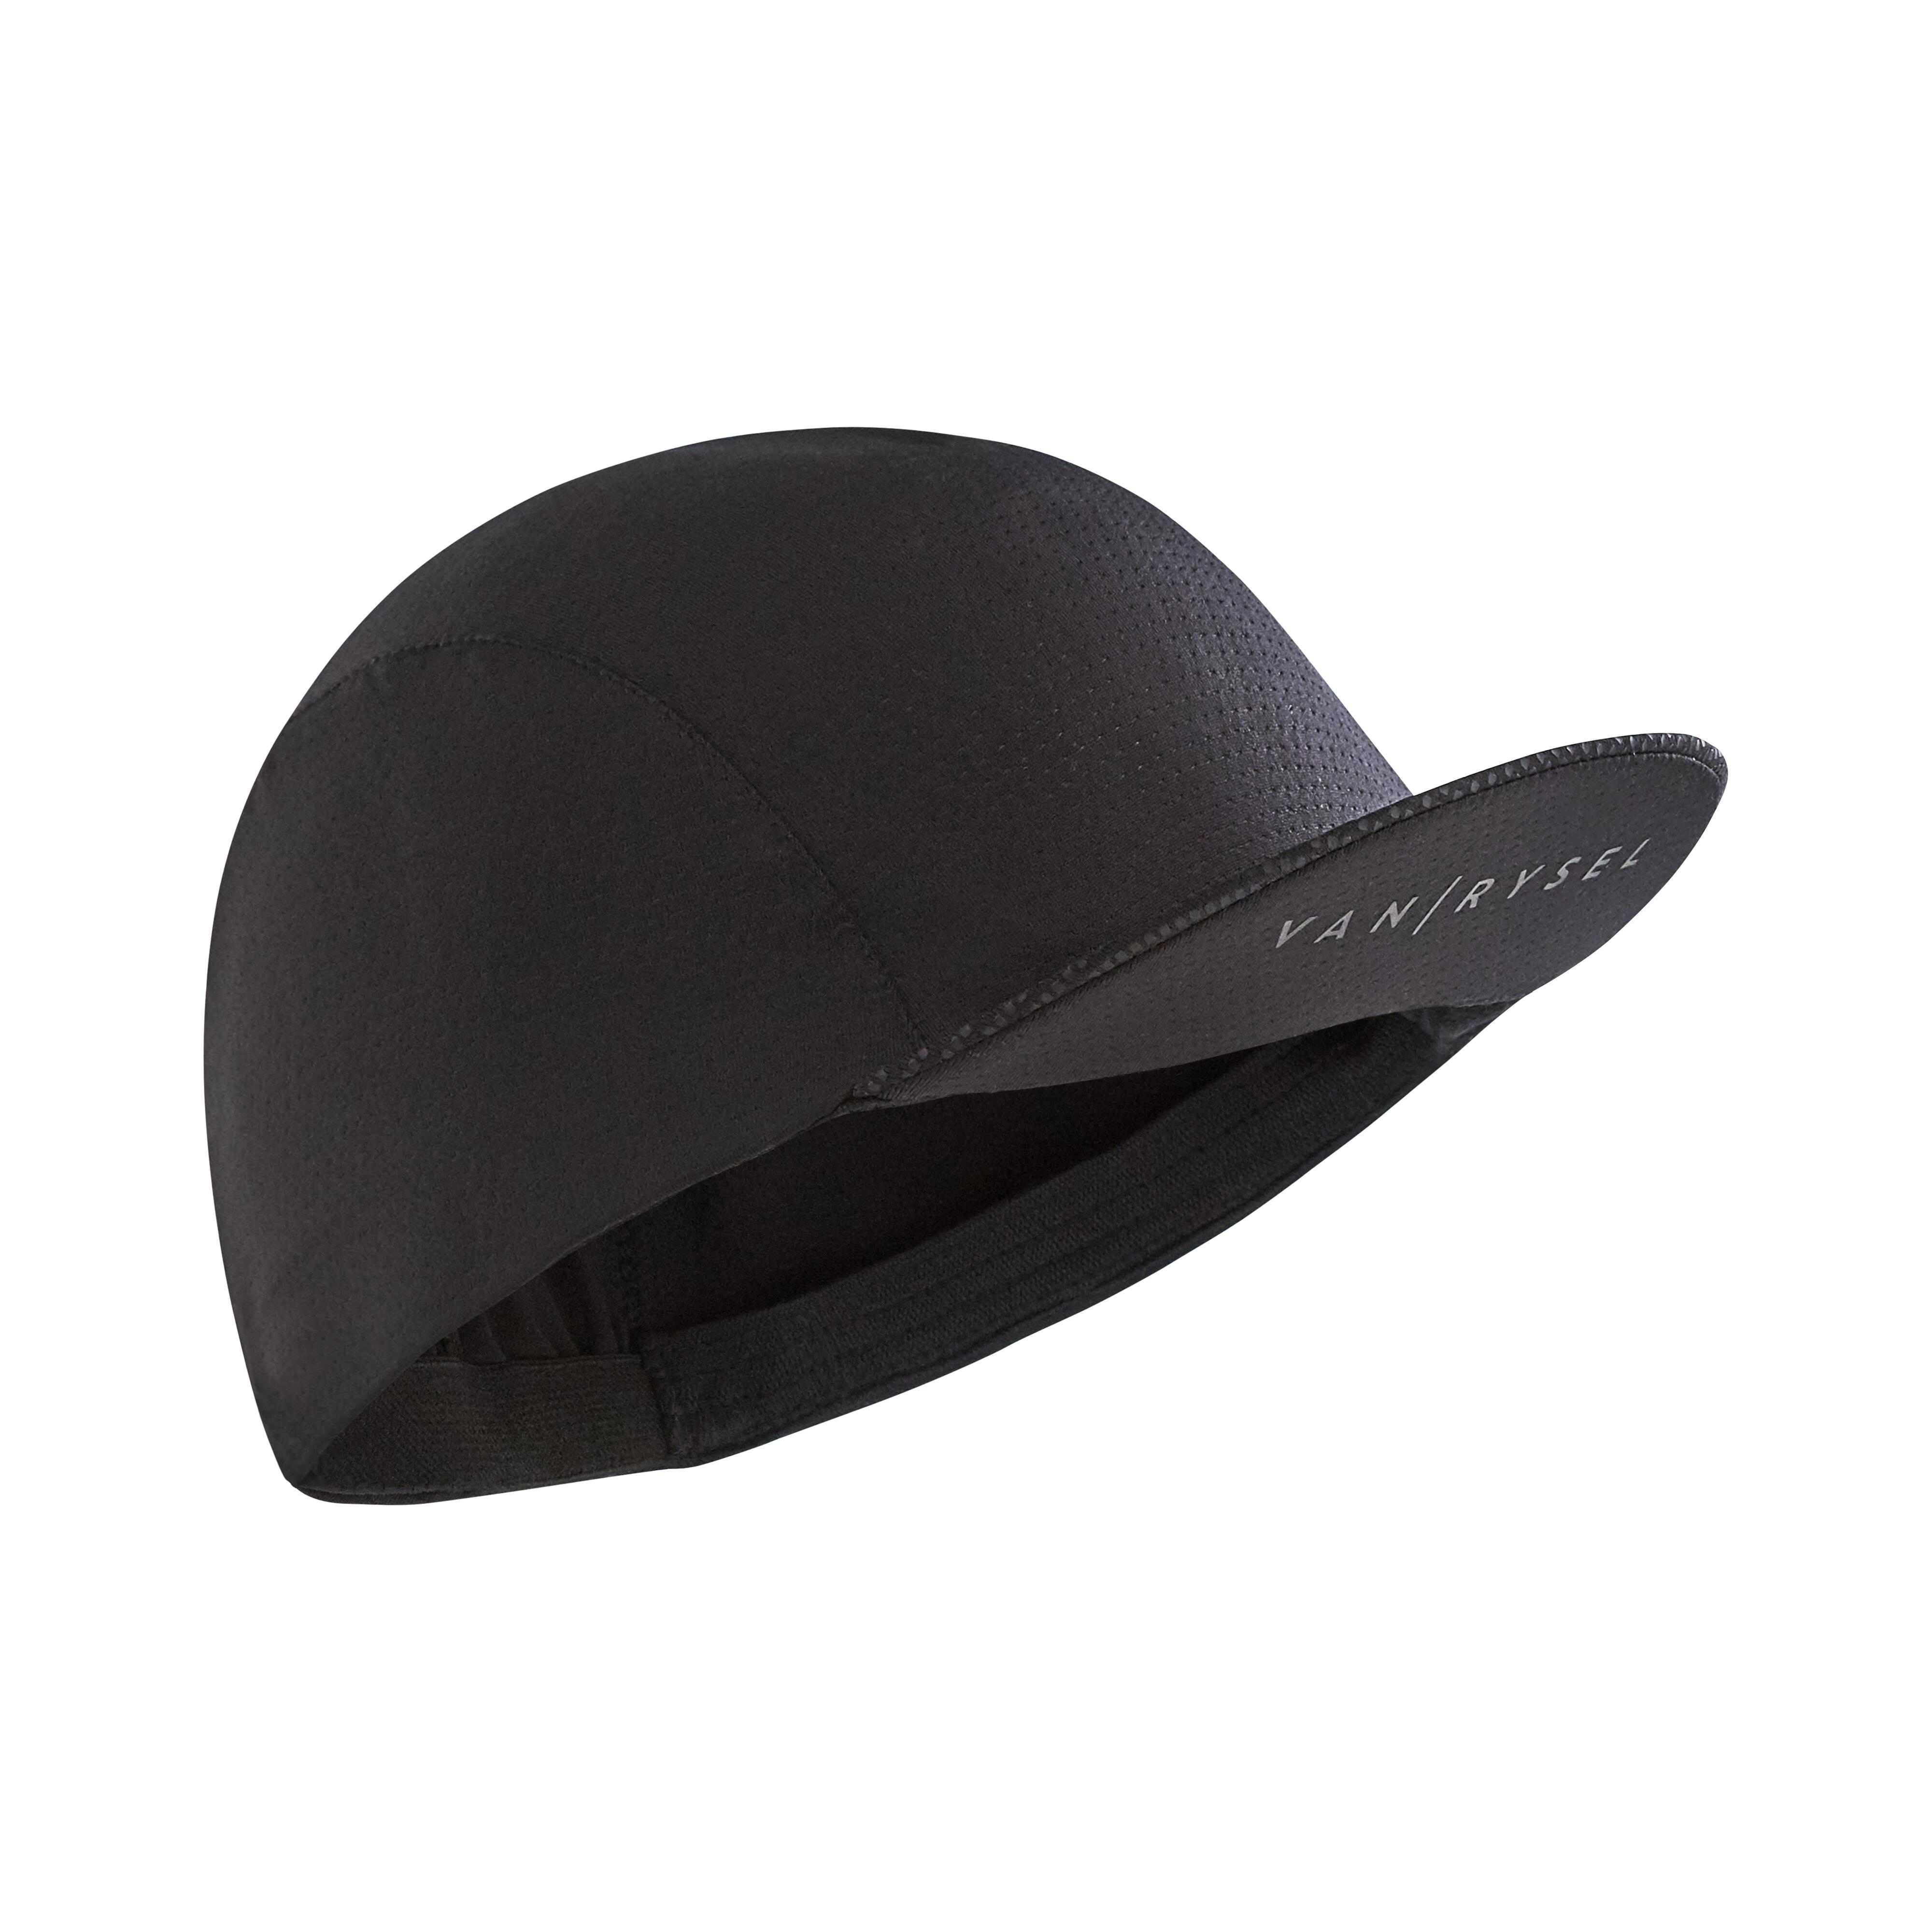 Șapcă ciclism ROADR 500 Negru imagine